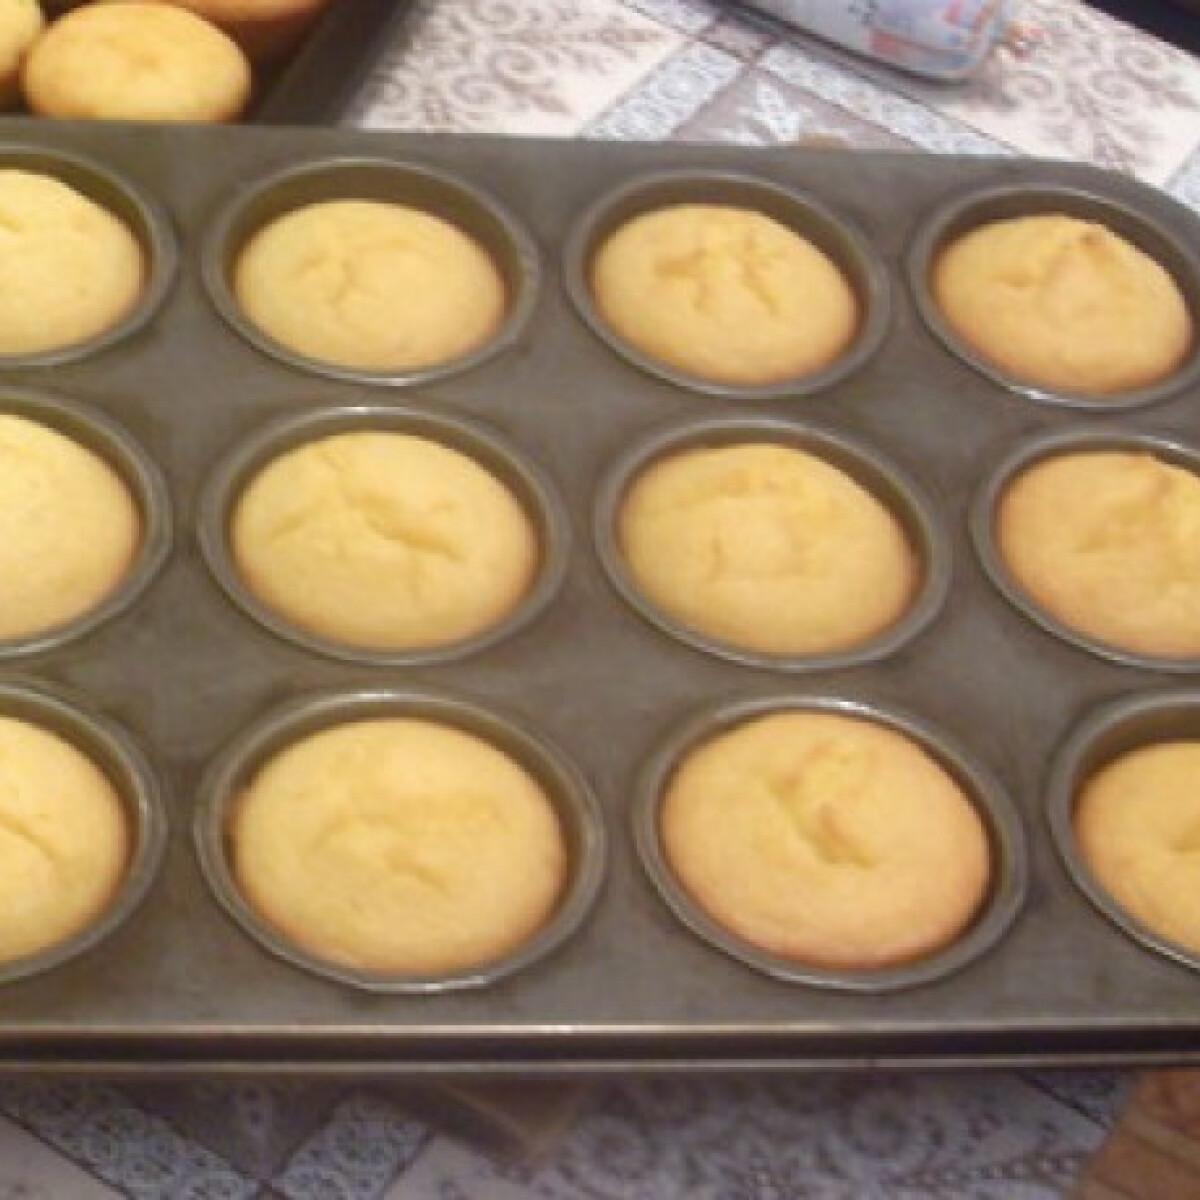 Kukoricadarás muffin